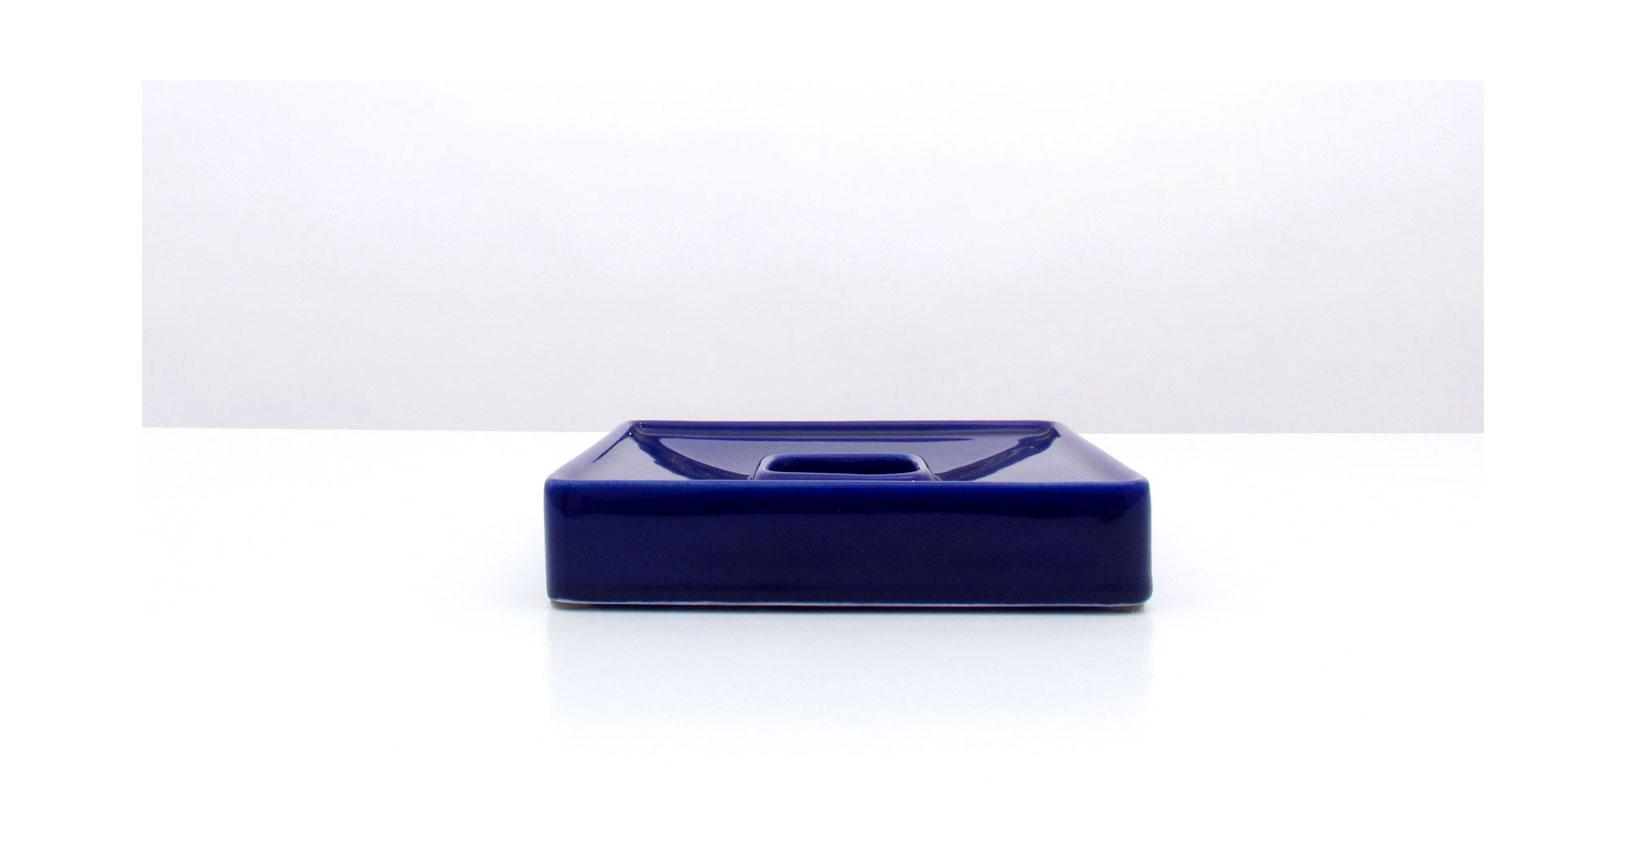 brambilla blu posacenere ceramica design vintage